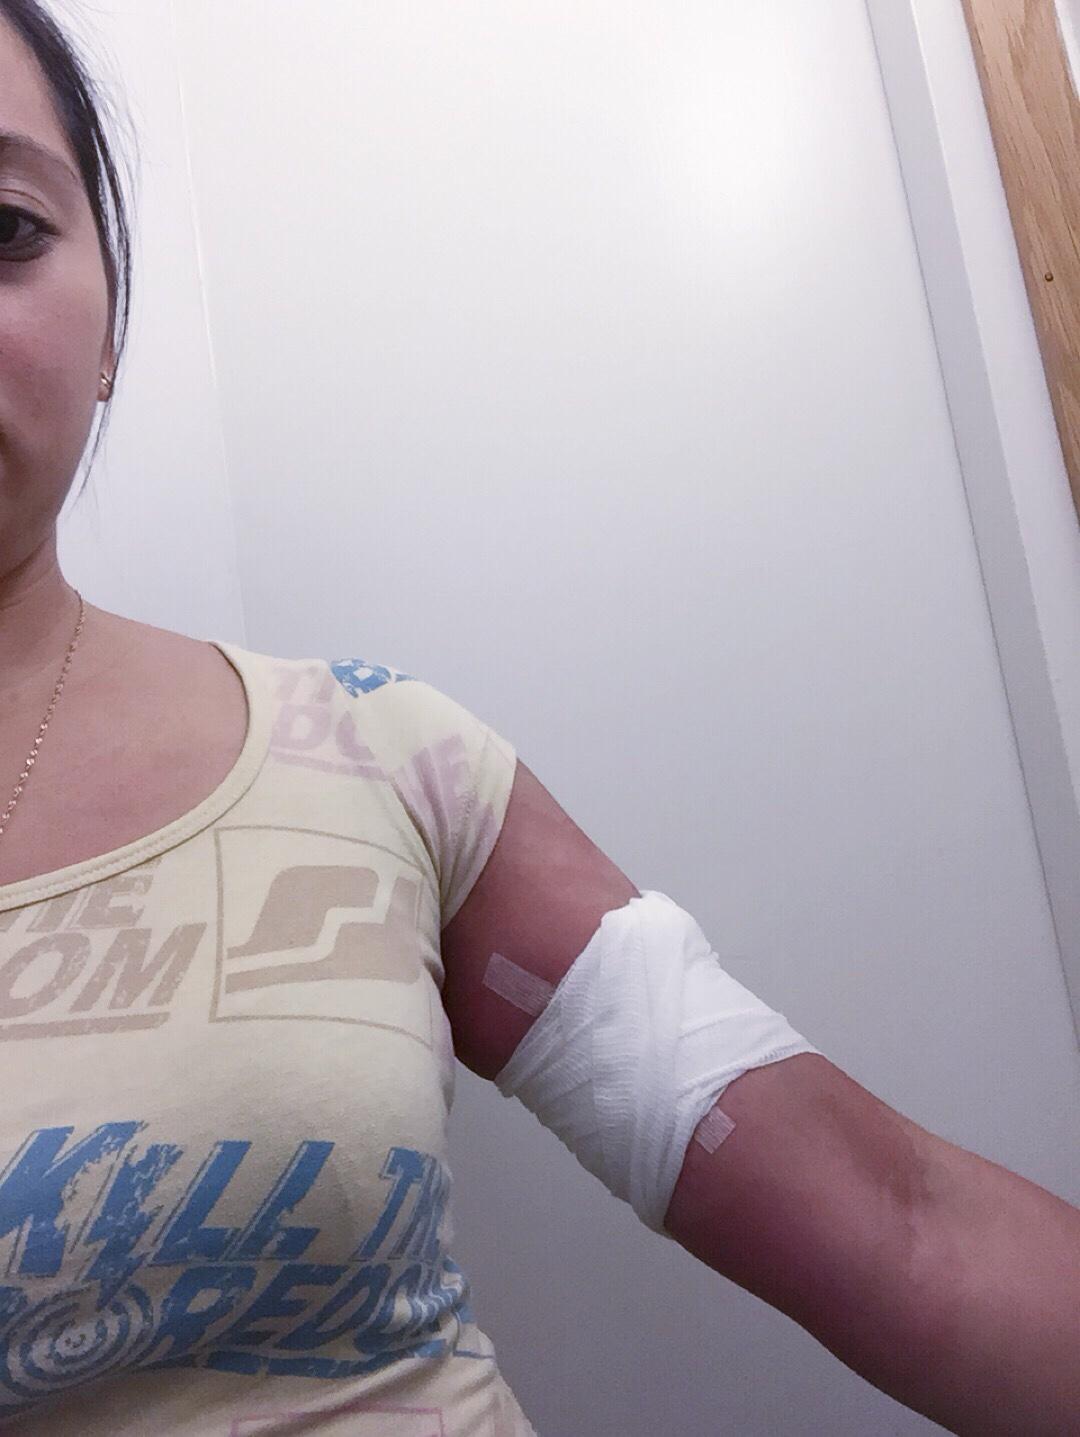 Nexplanon Implant Removal - Aka Chymecindy